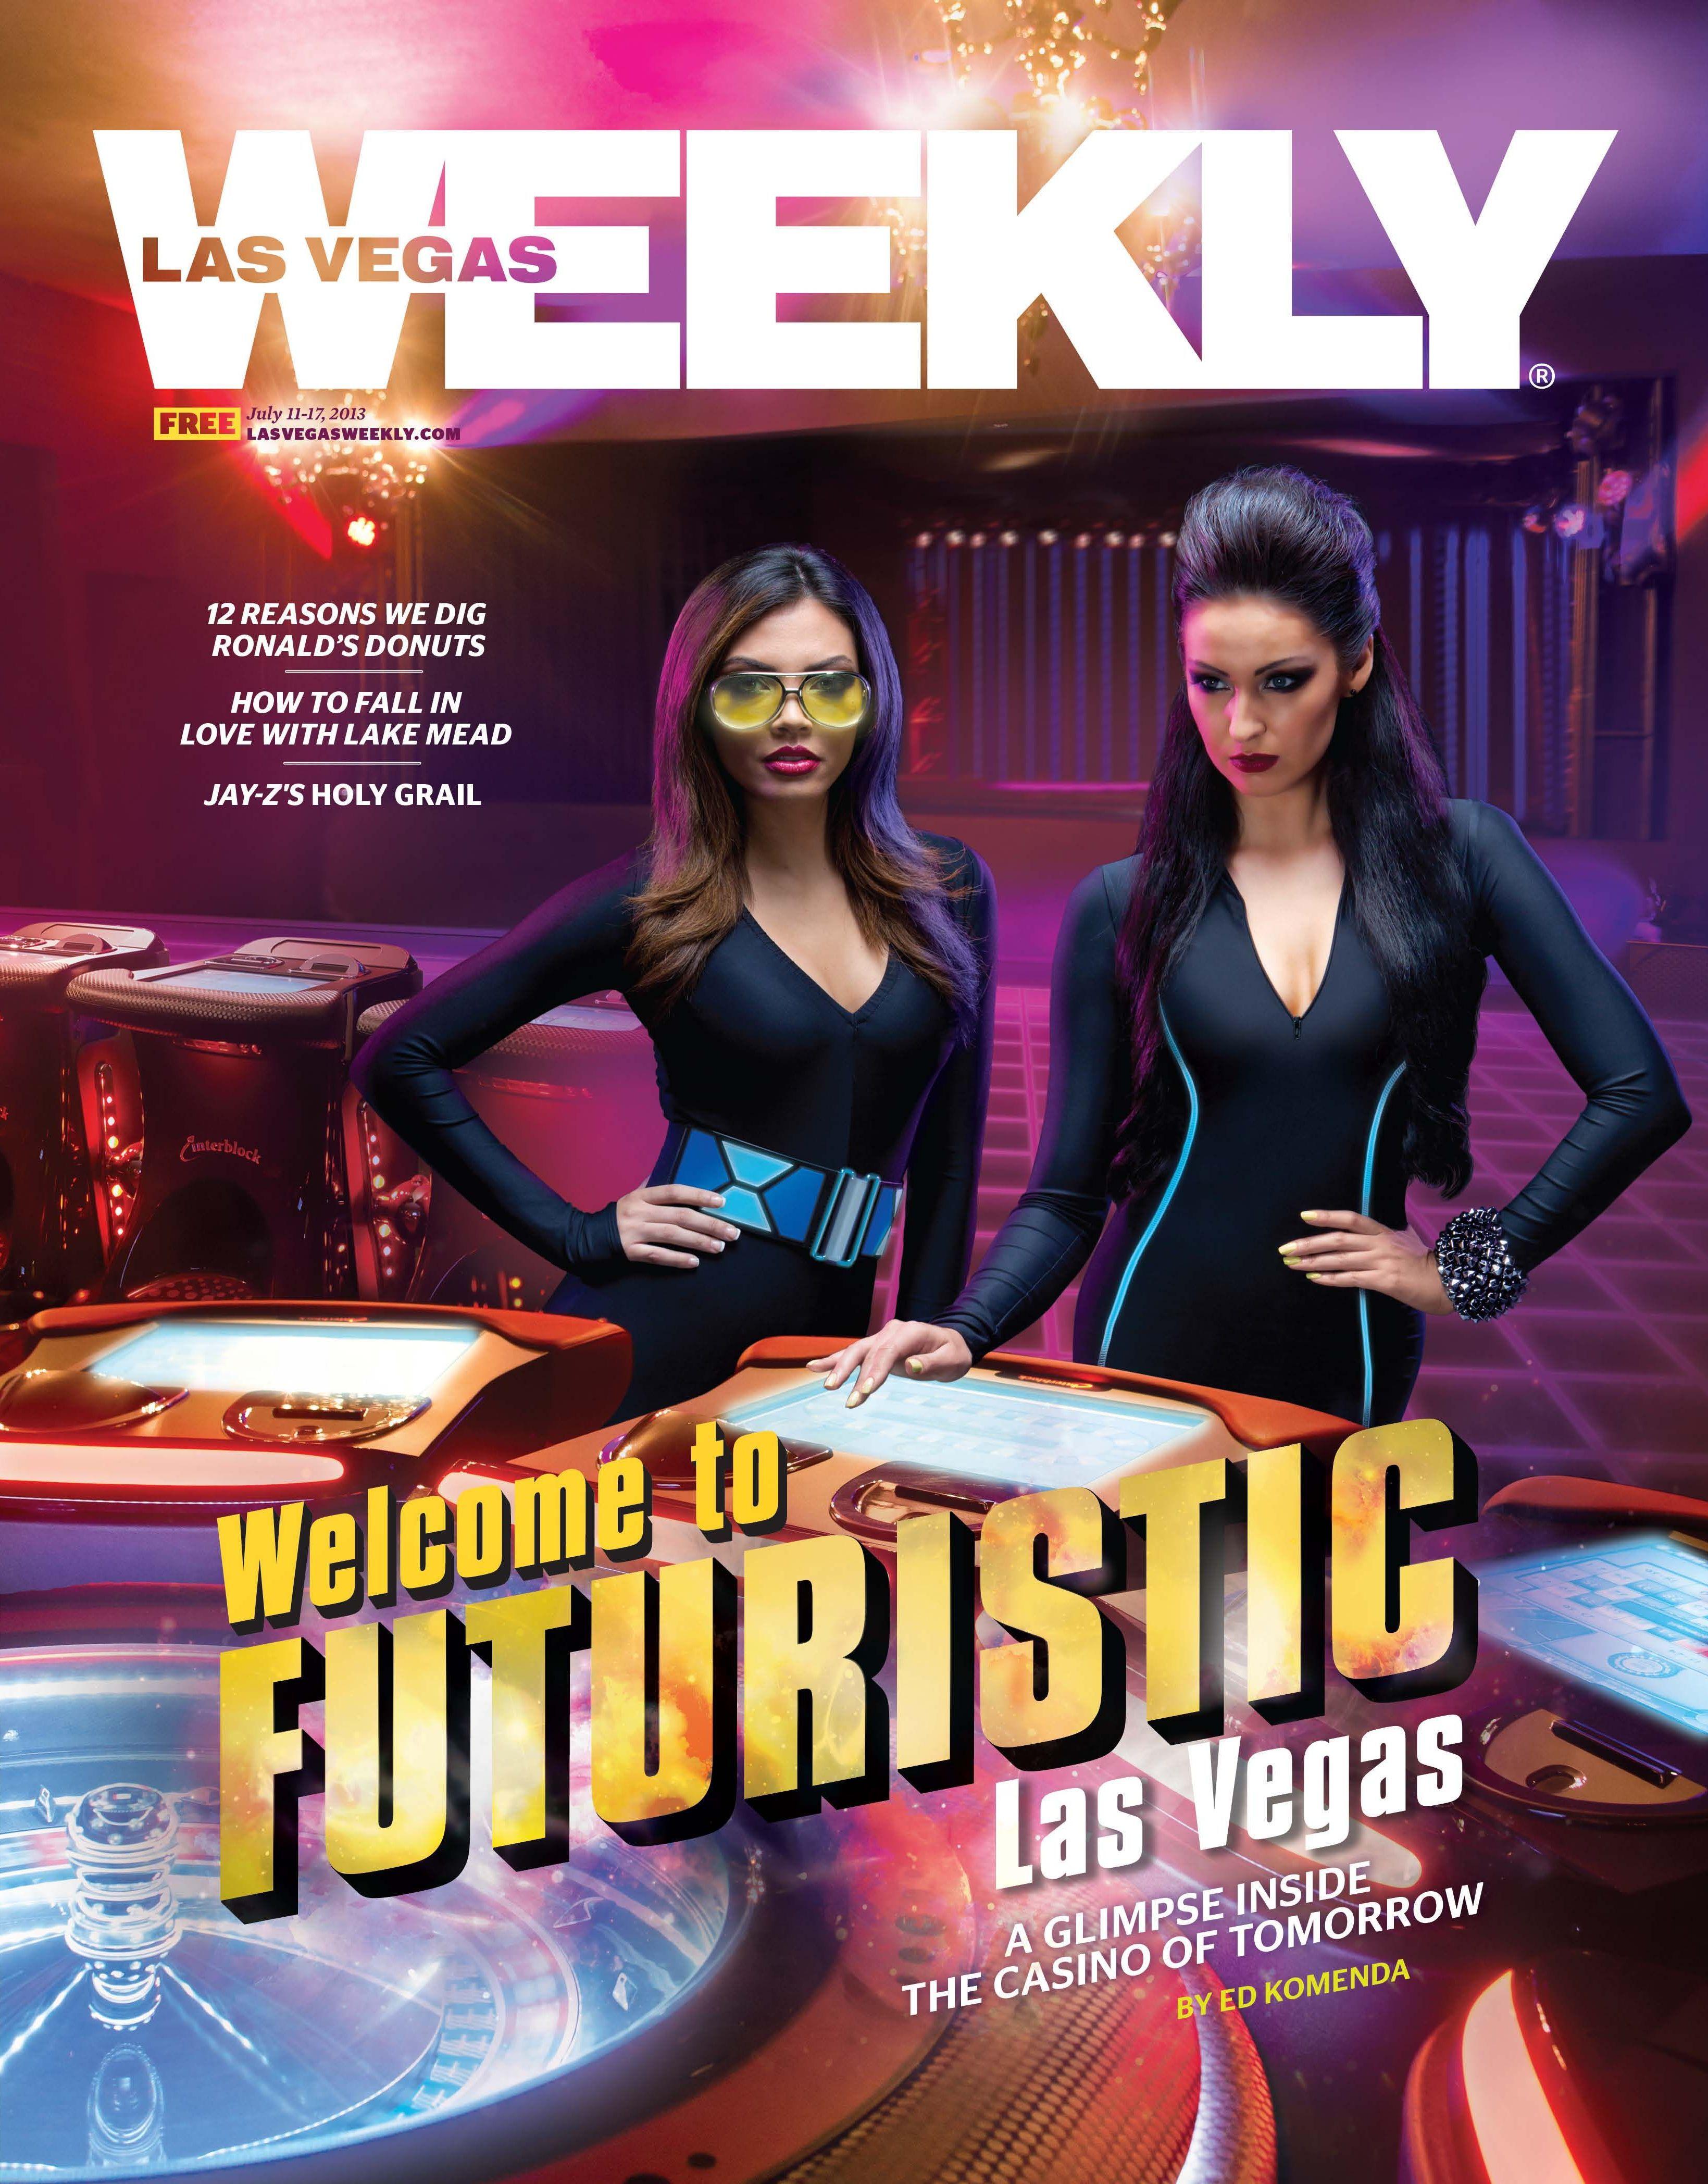 Pin by Juju Fleur on Future posts | Nevada, Las vegas, Saw